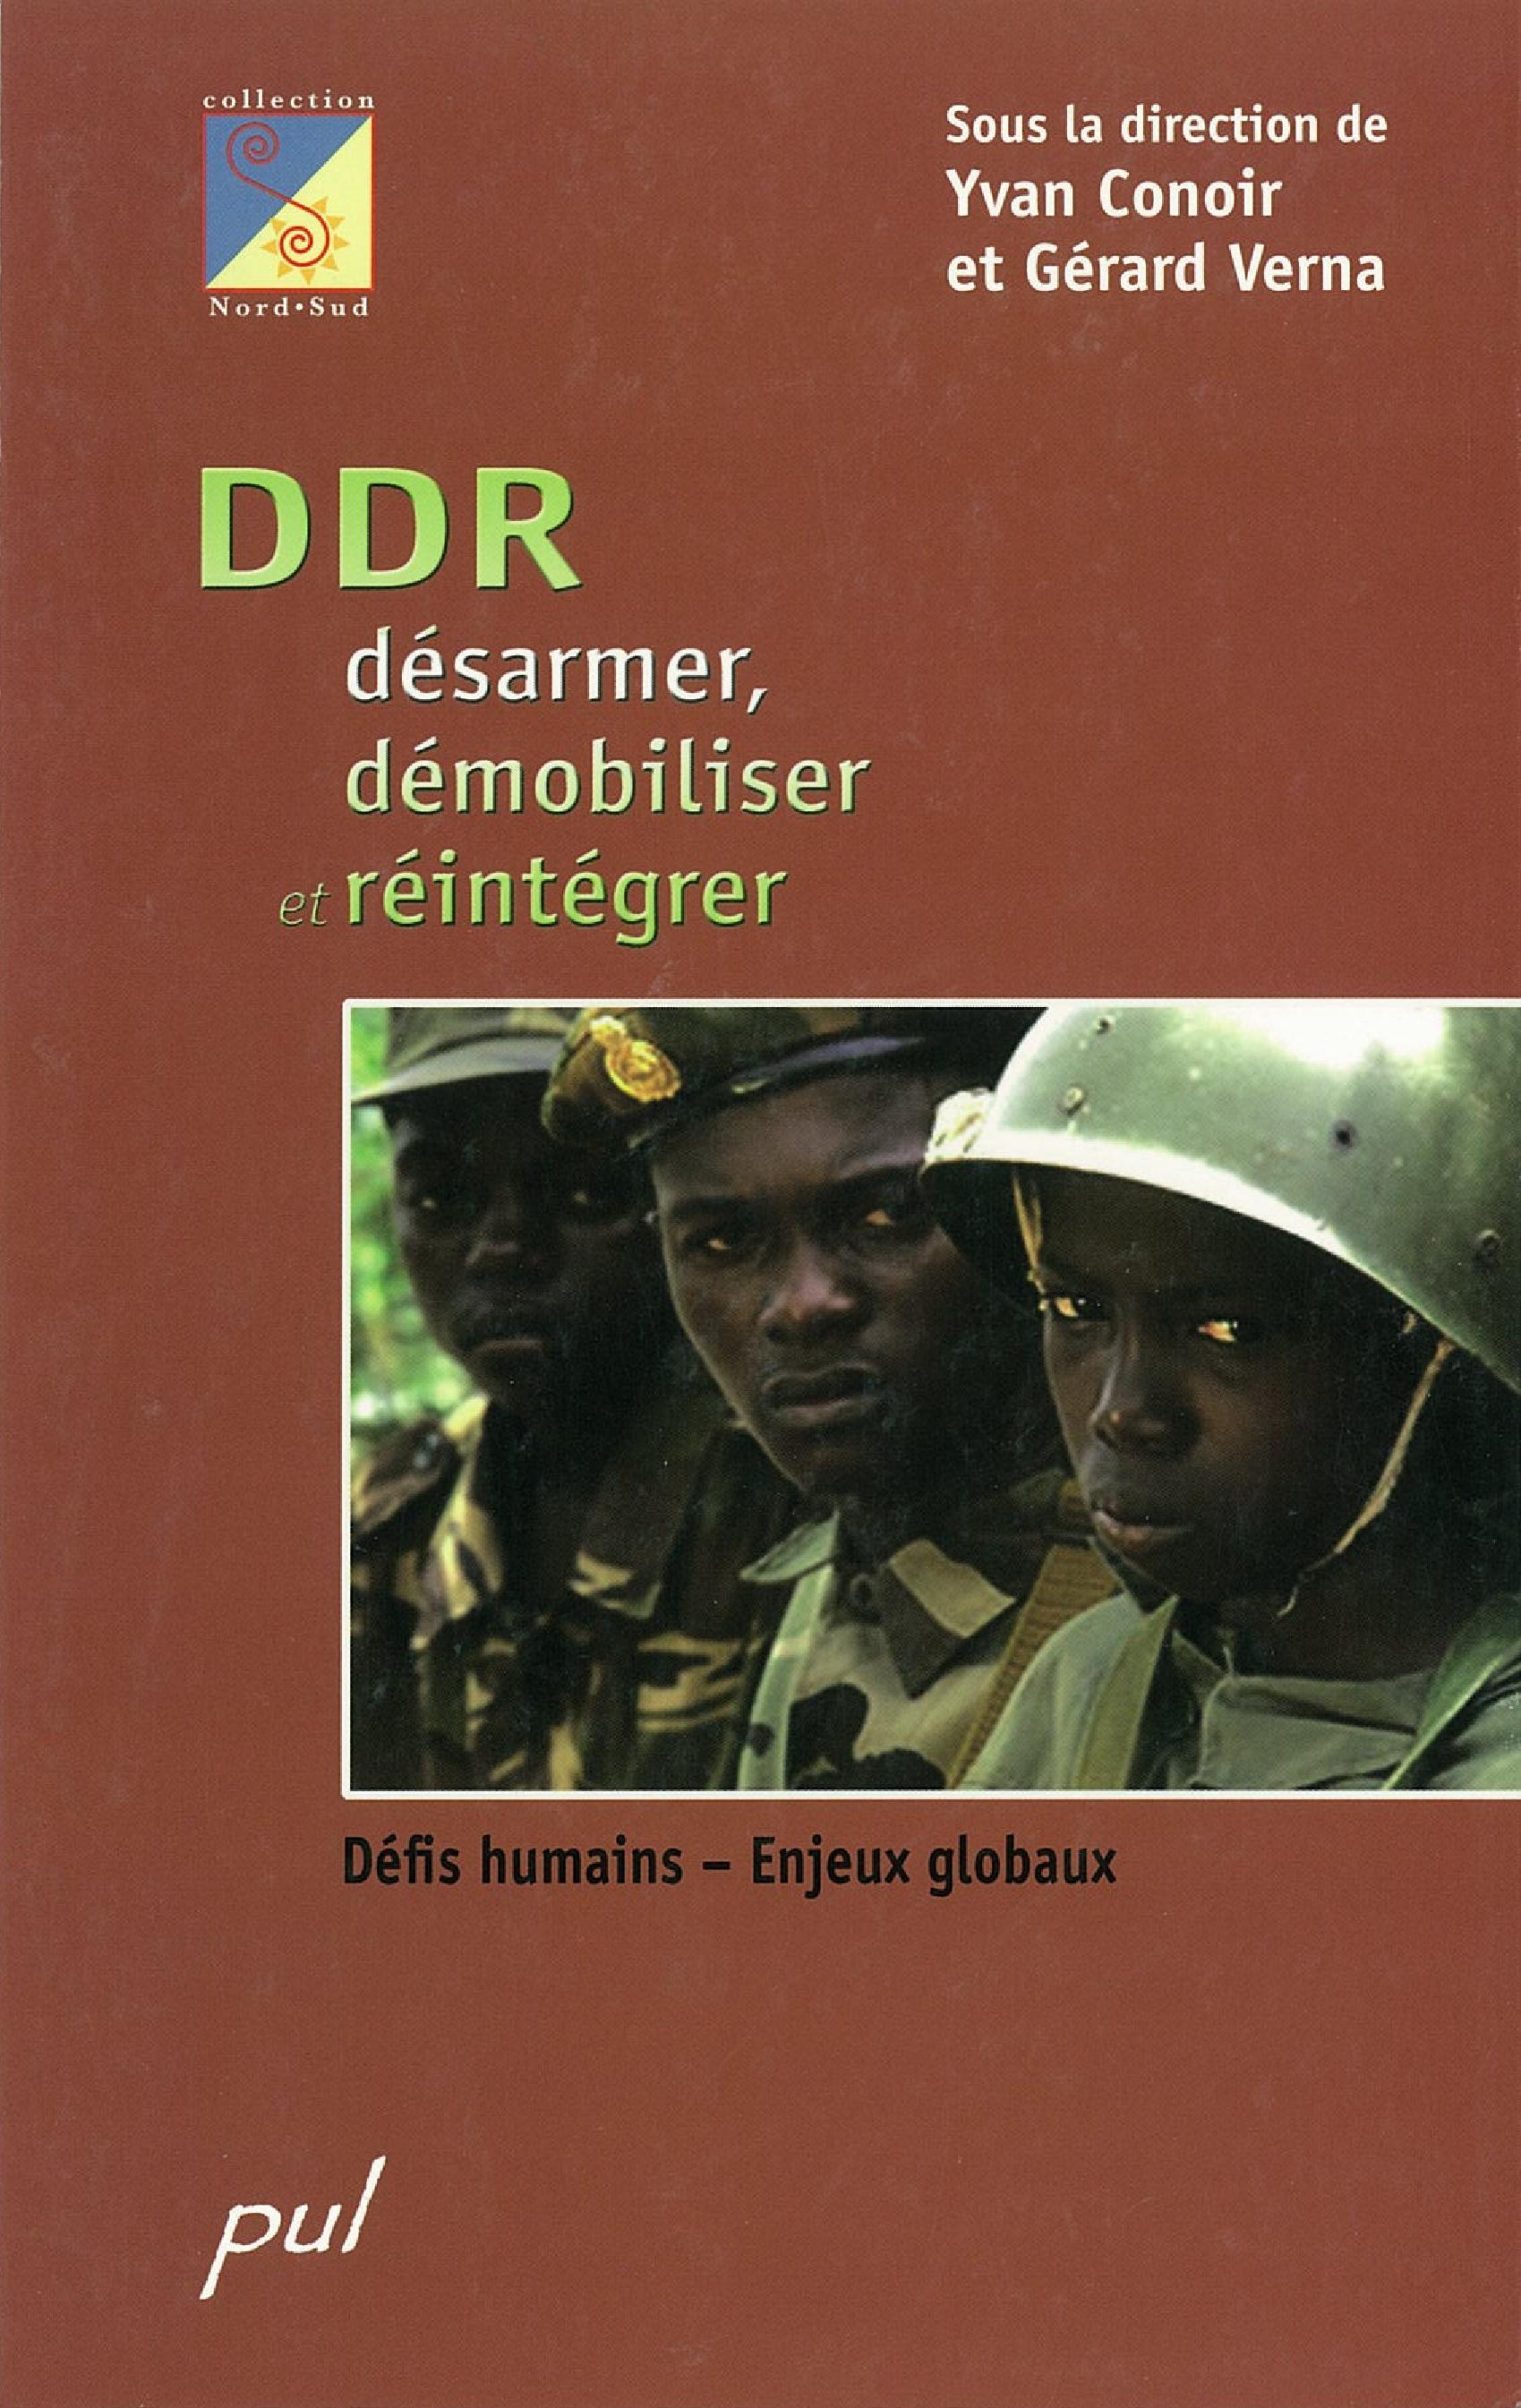 DRD: Désarmer, démobiliser, réintégrer